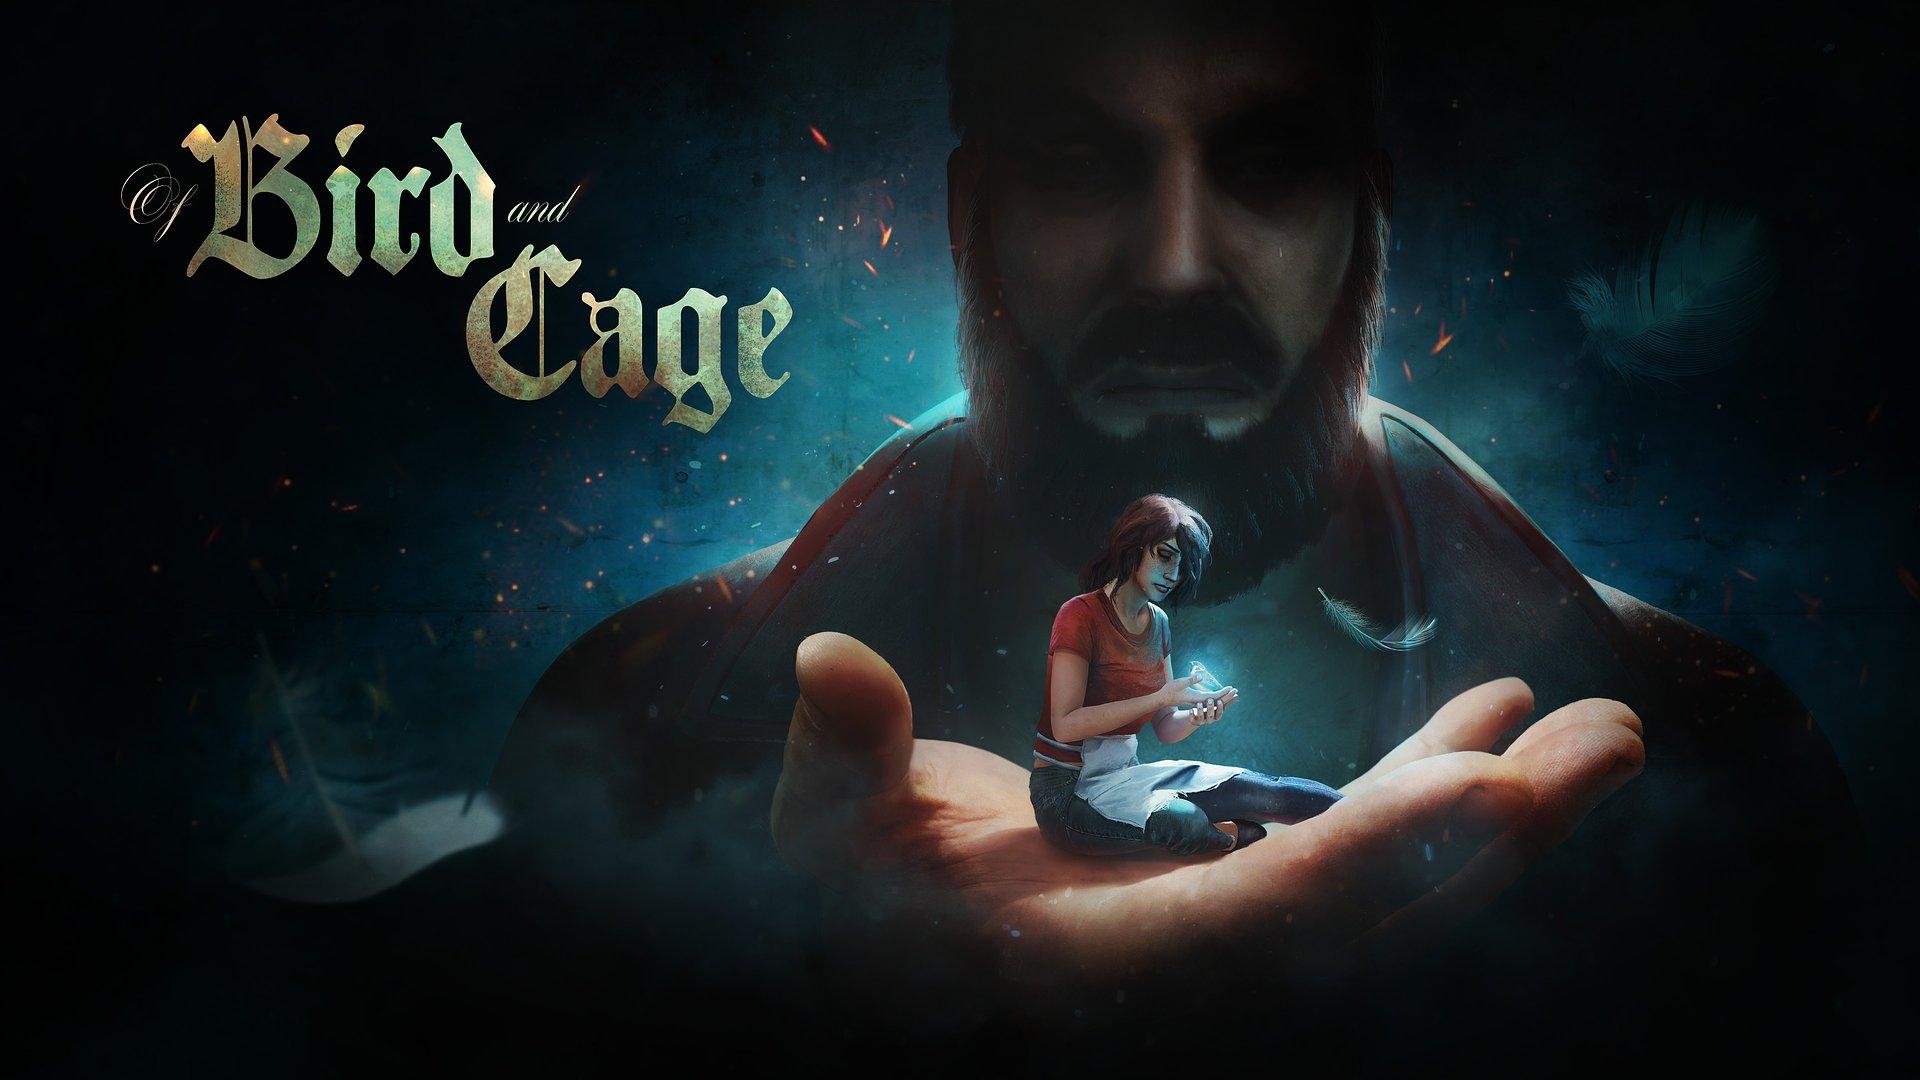 Of Bird and Cage już dostępne!